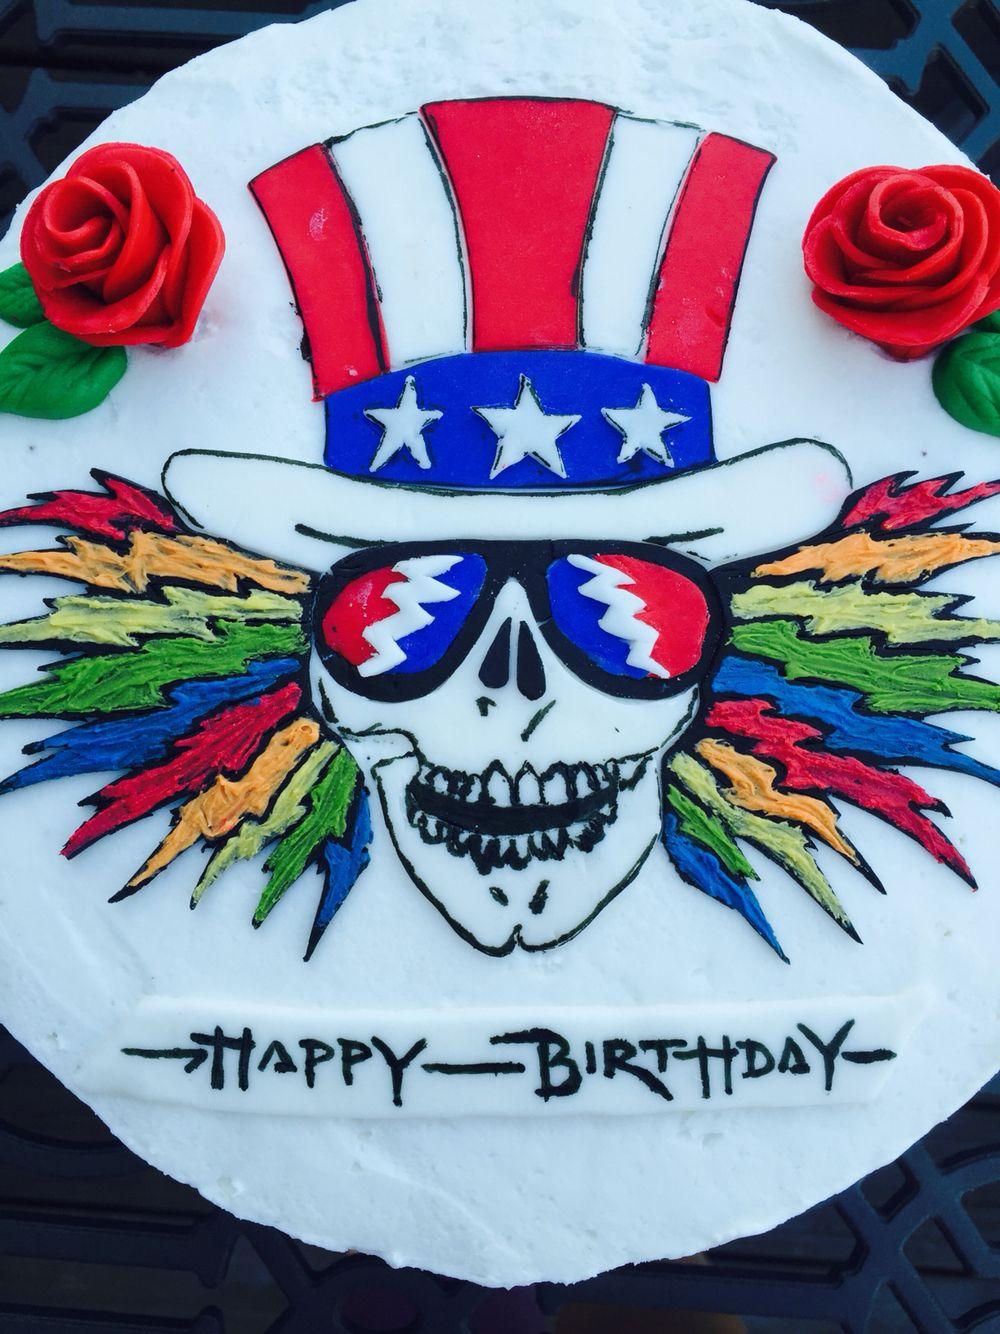 Grateful Dead Birthday Cake | Eat Cake | Grateful dead quotes